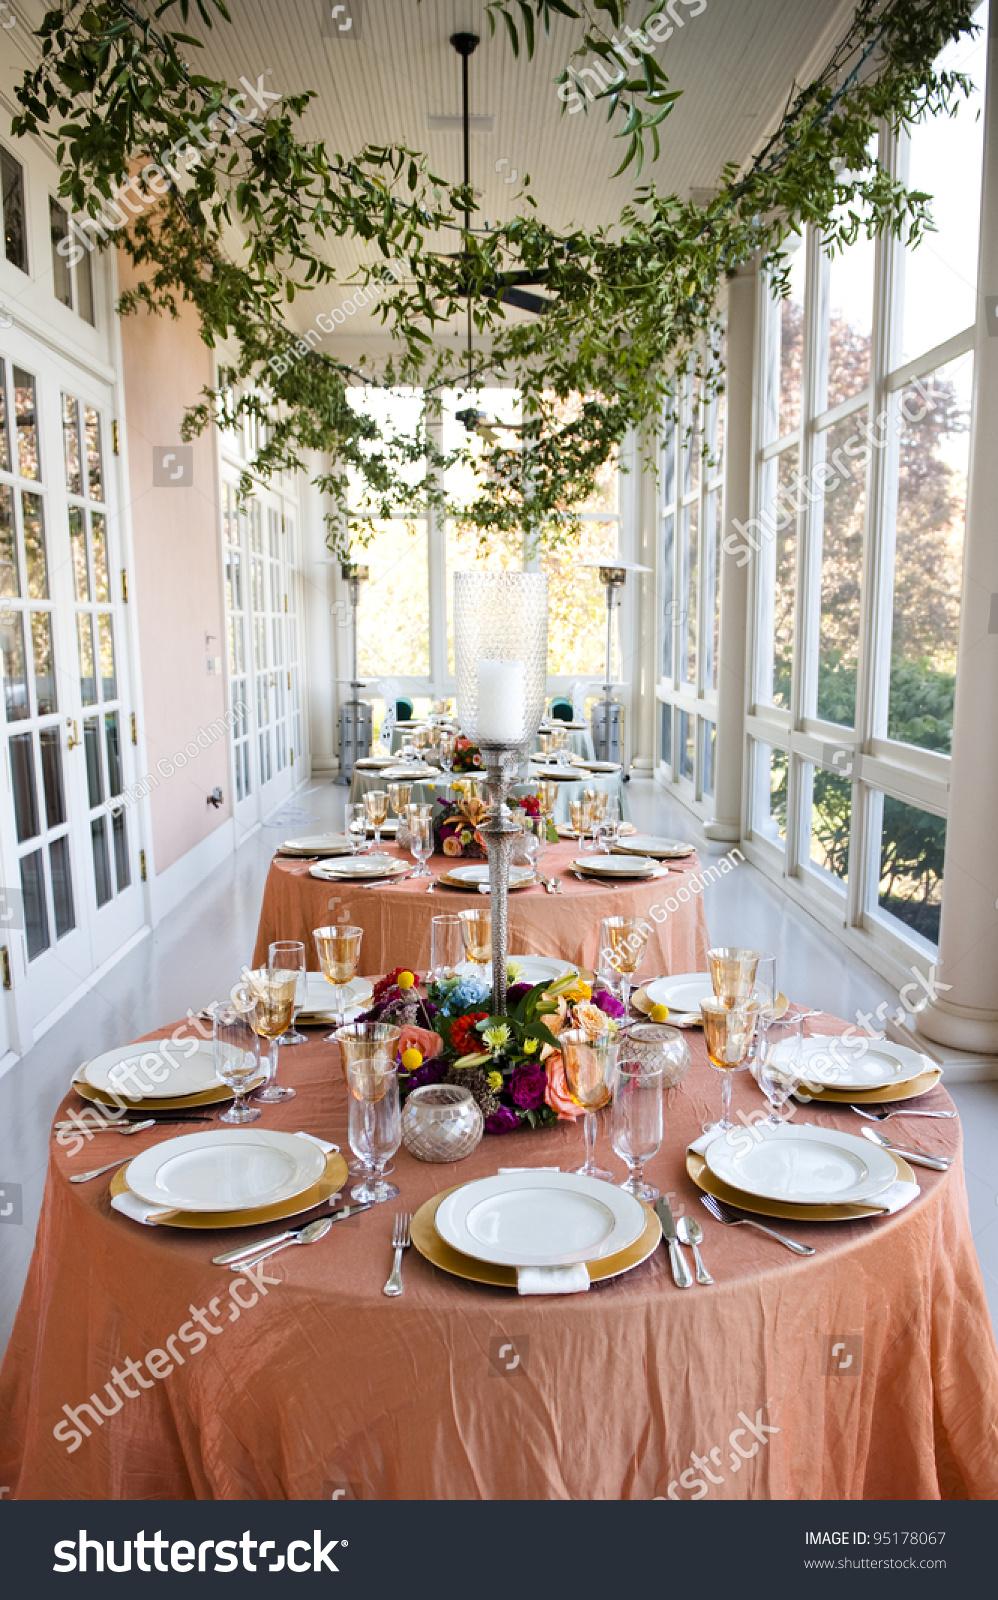 Table Setting Wedding Reception Stock Photo Royalty Free 95178067